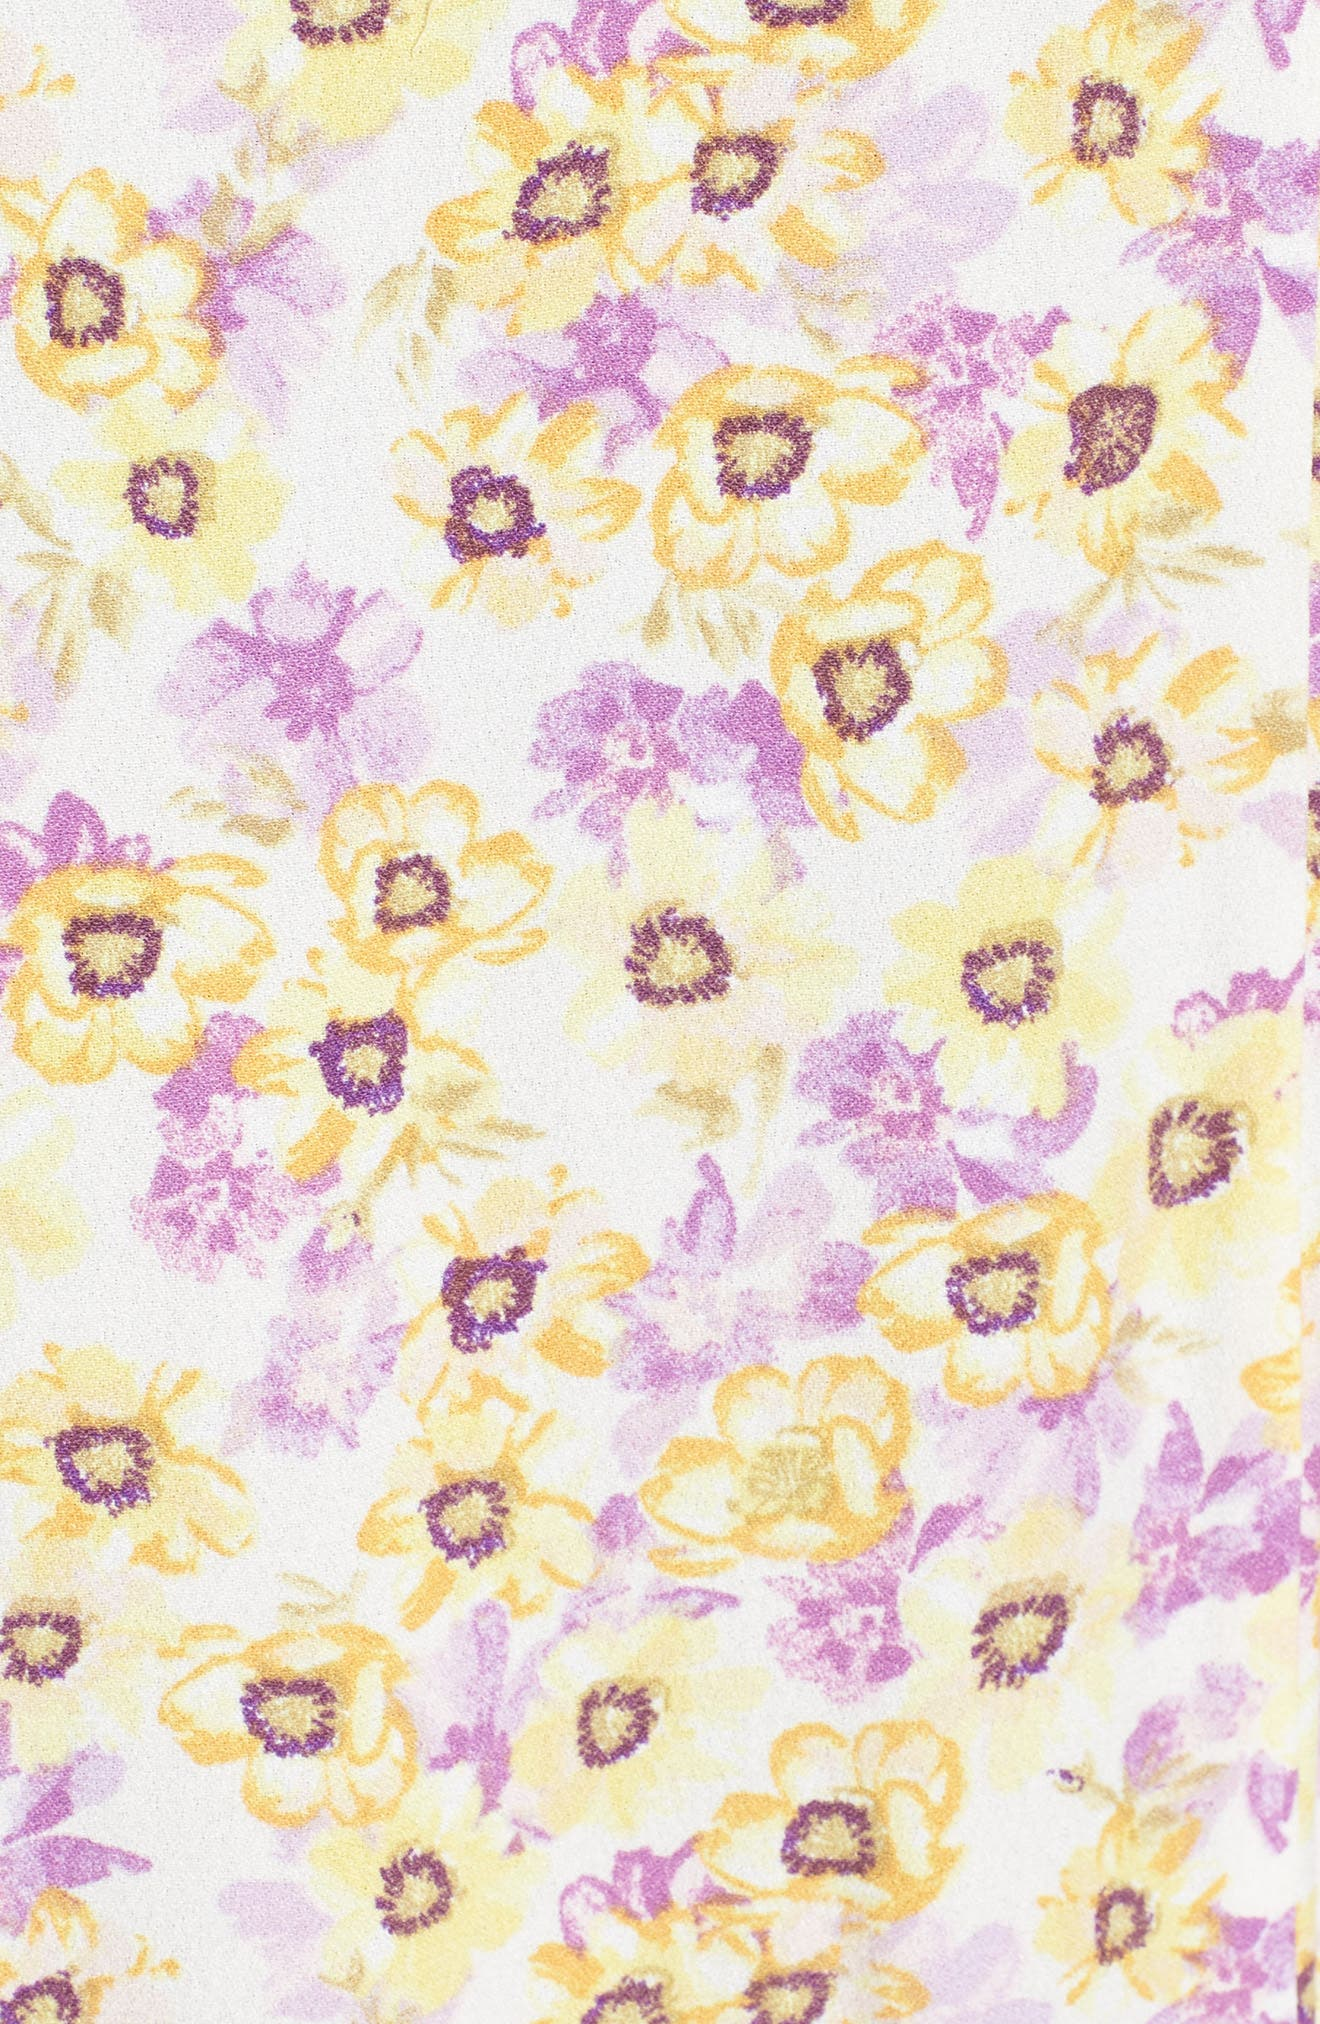 Tuscany Maxi Dress,                             Alternate thumbnail 6, color,                             Yellow Garden